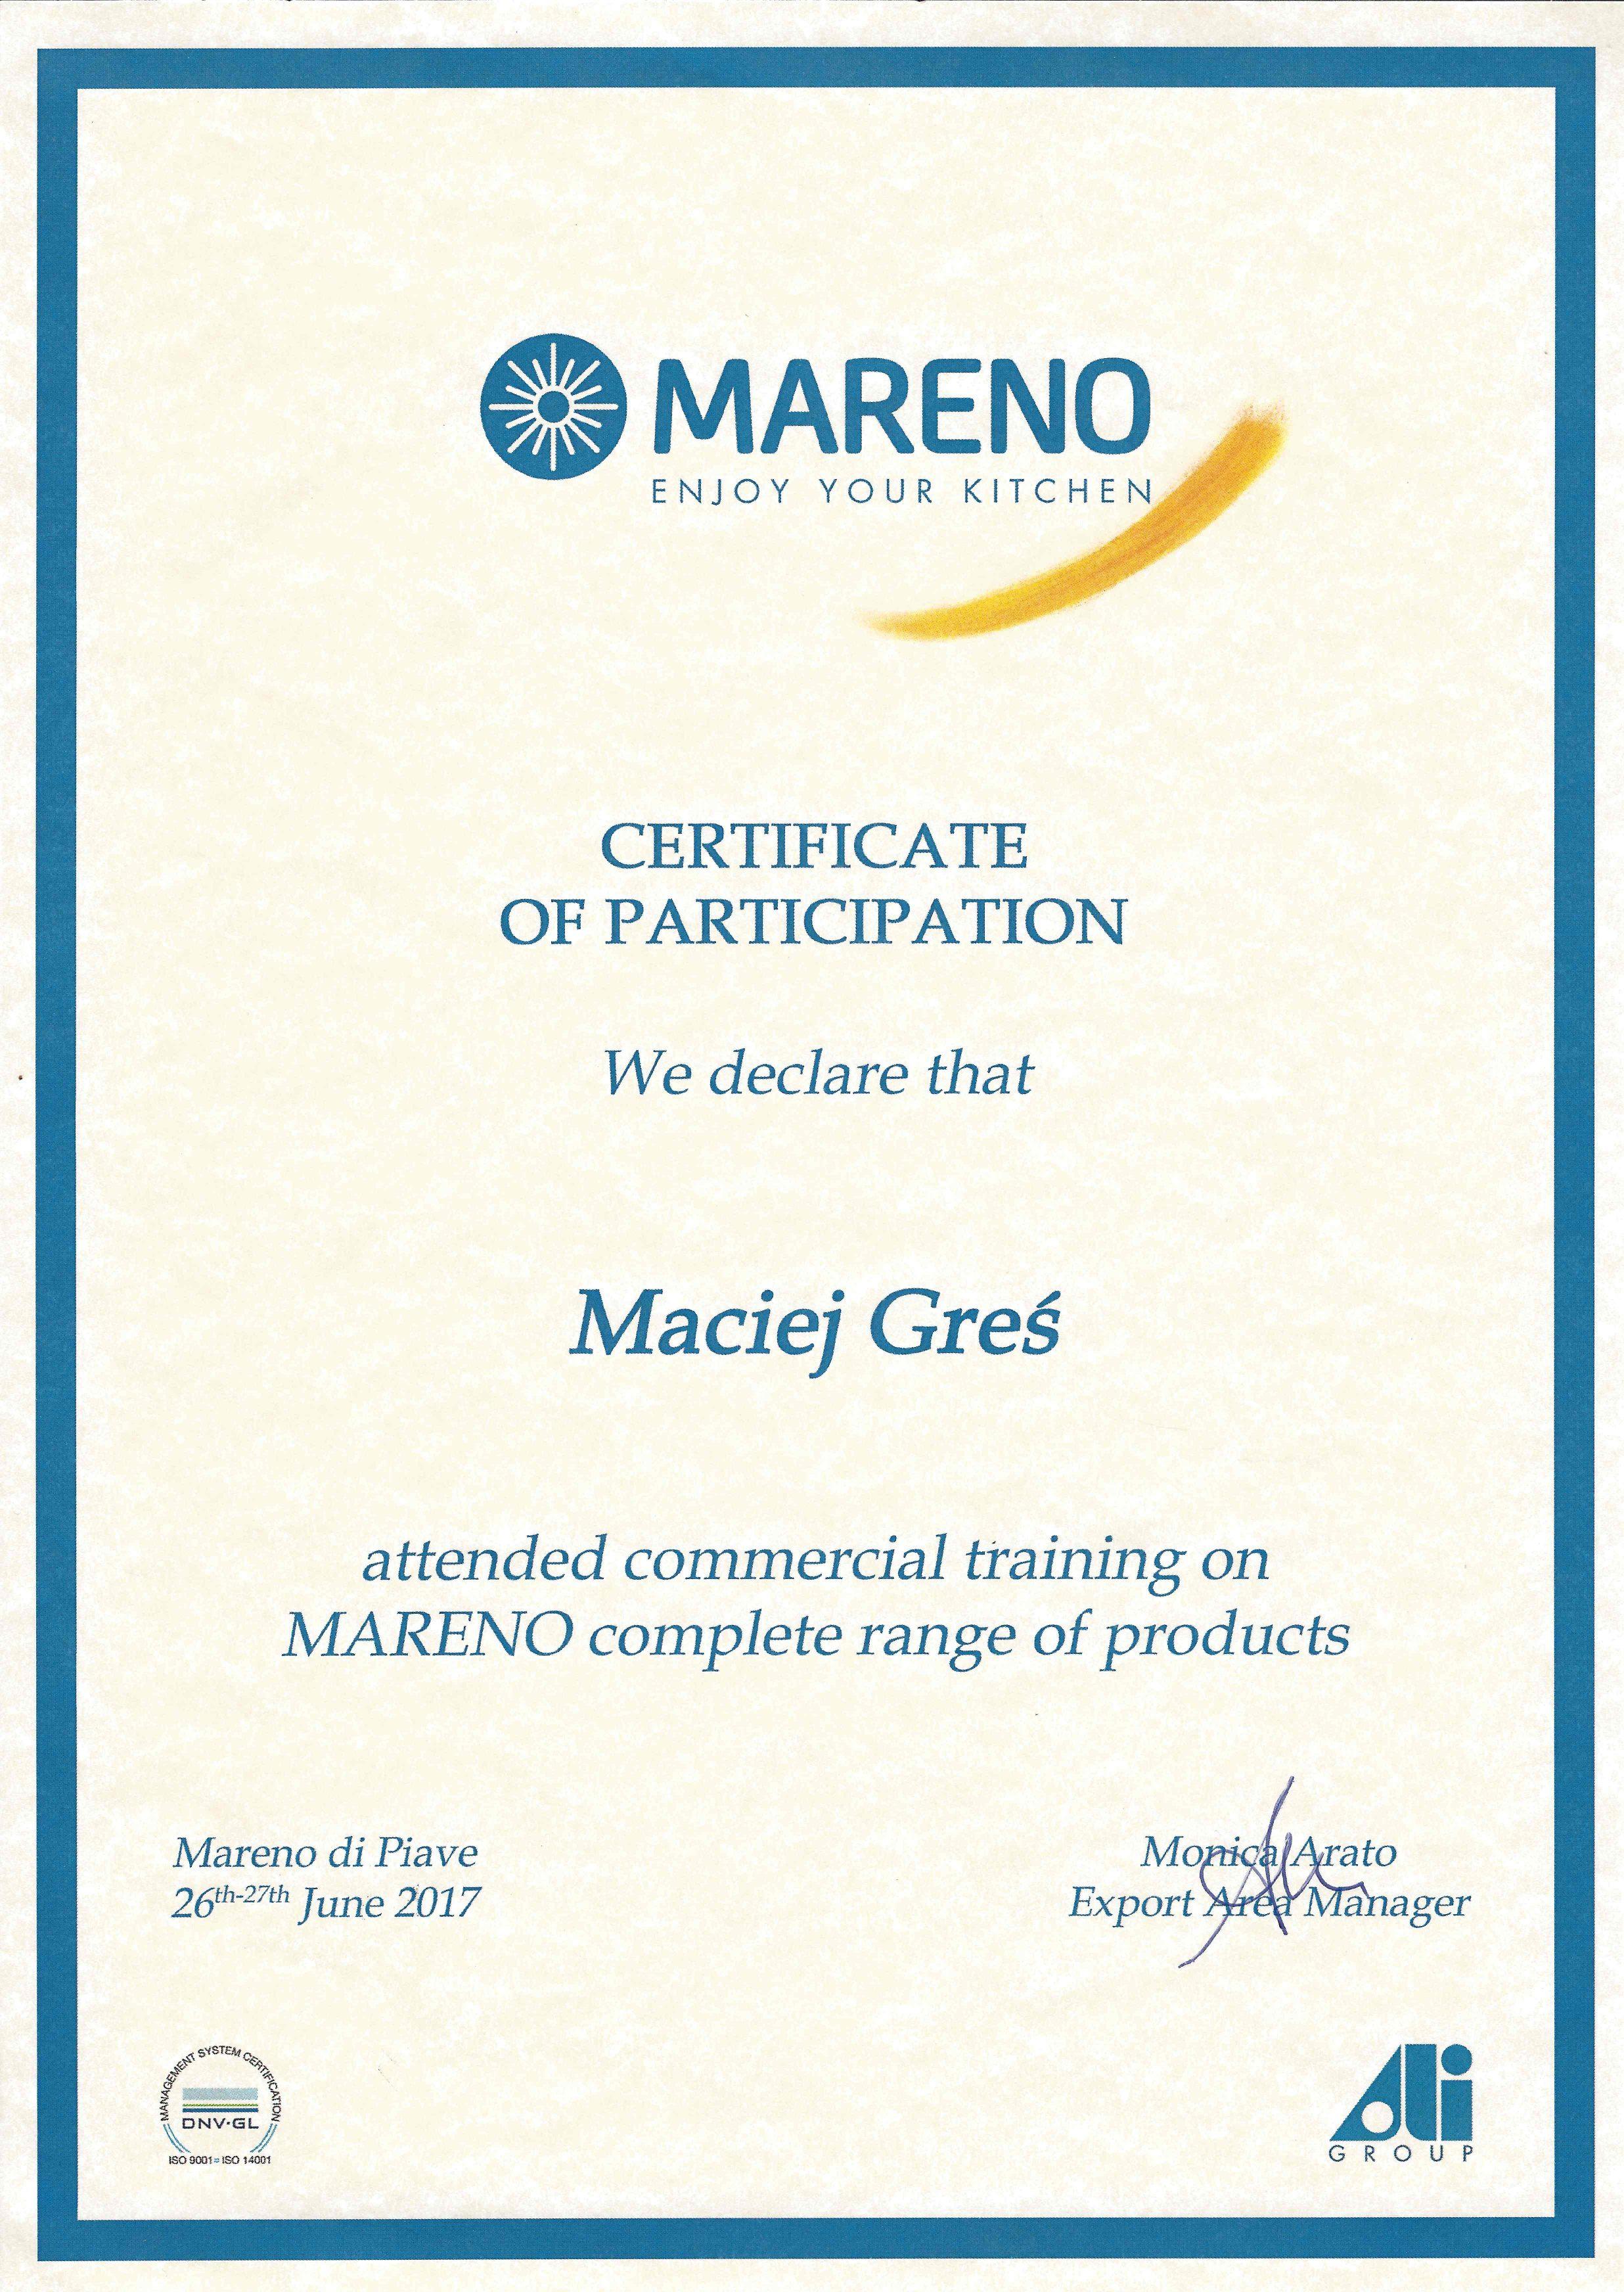 O firmie certyfikat moreno 2472x3488